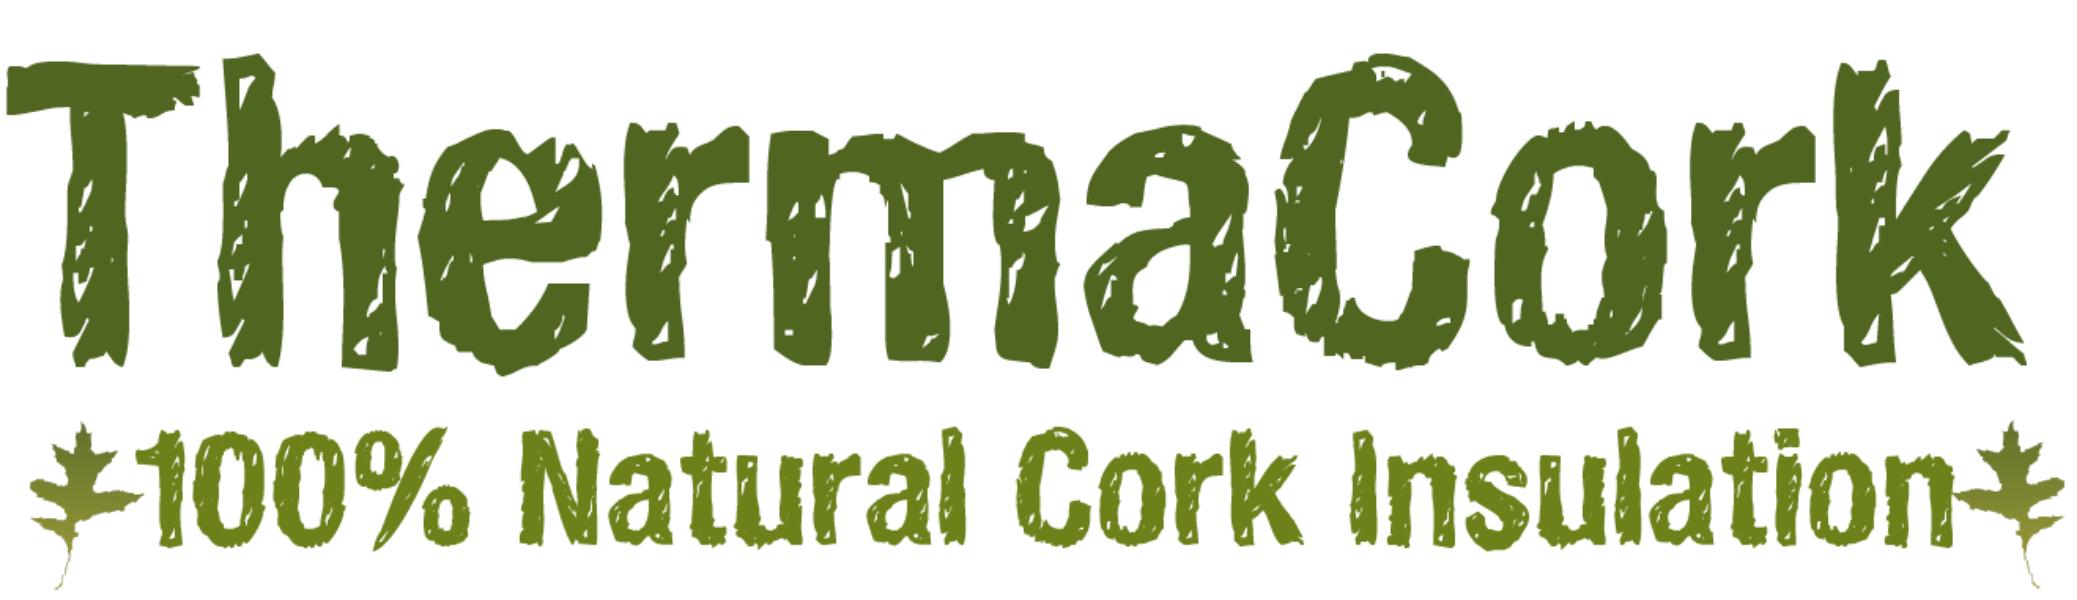 Cork Banner.png